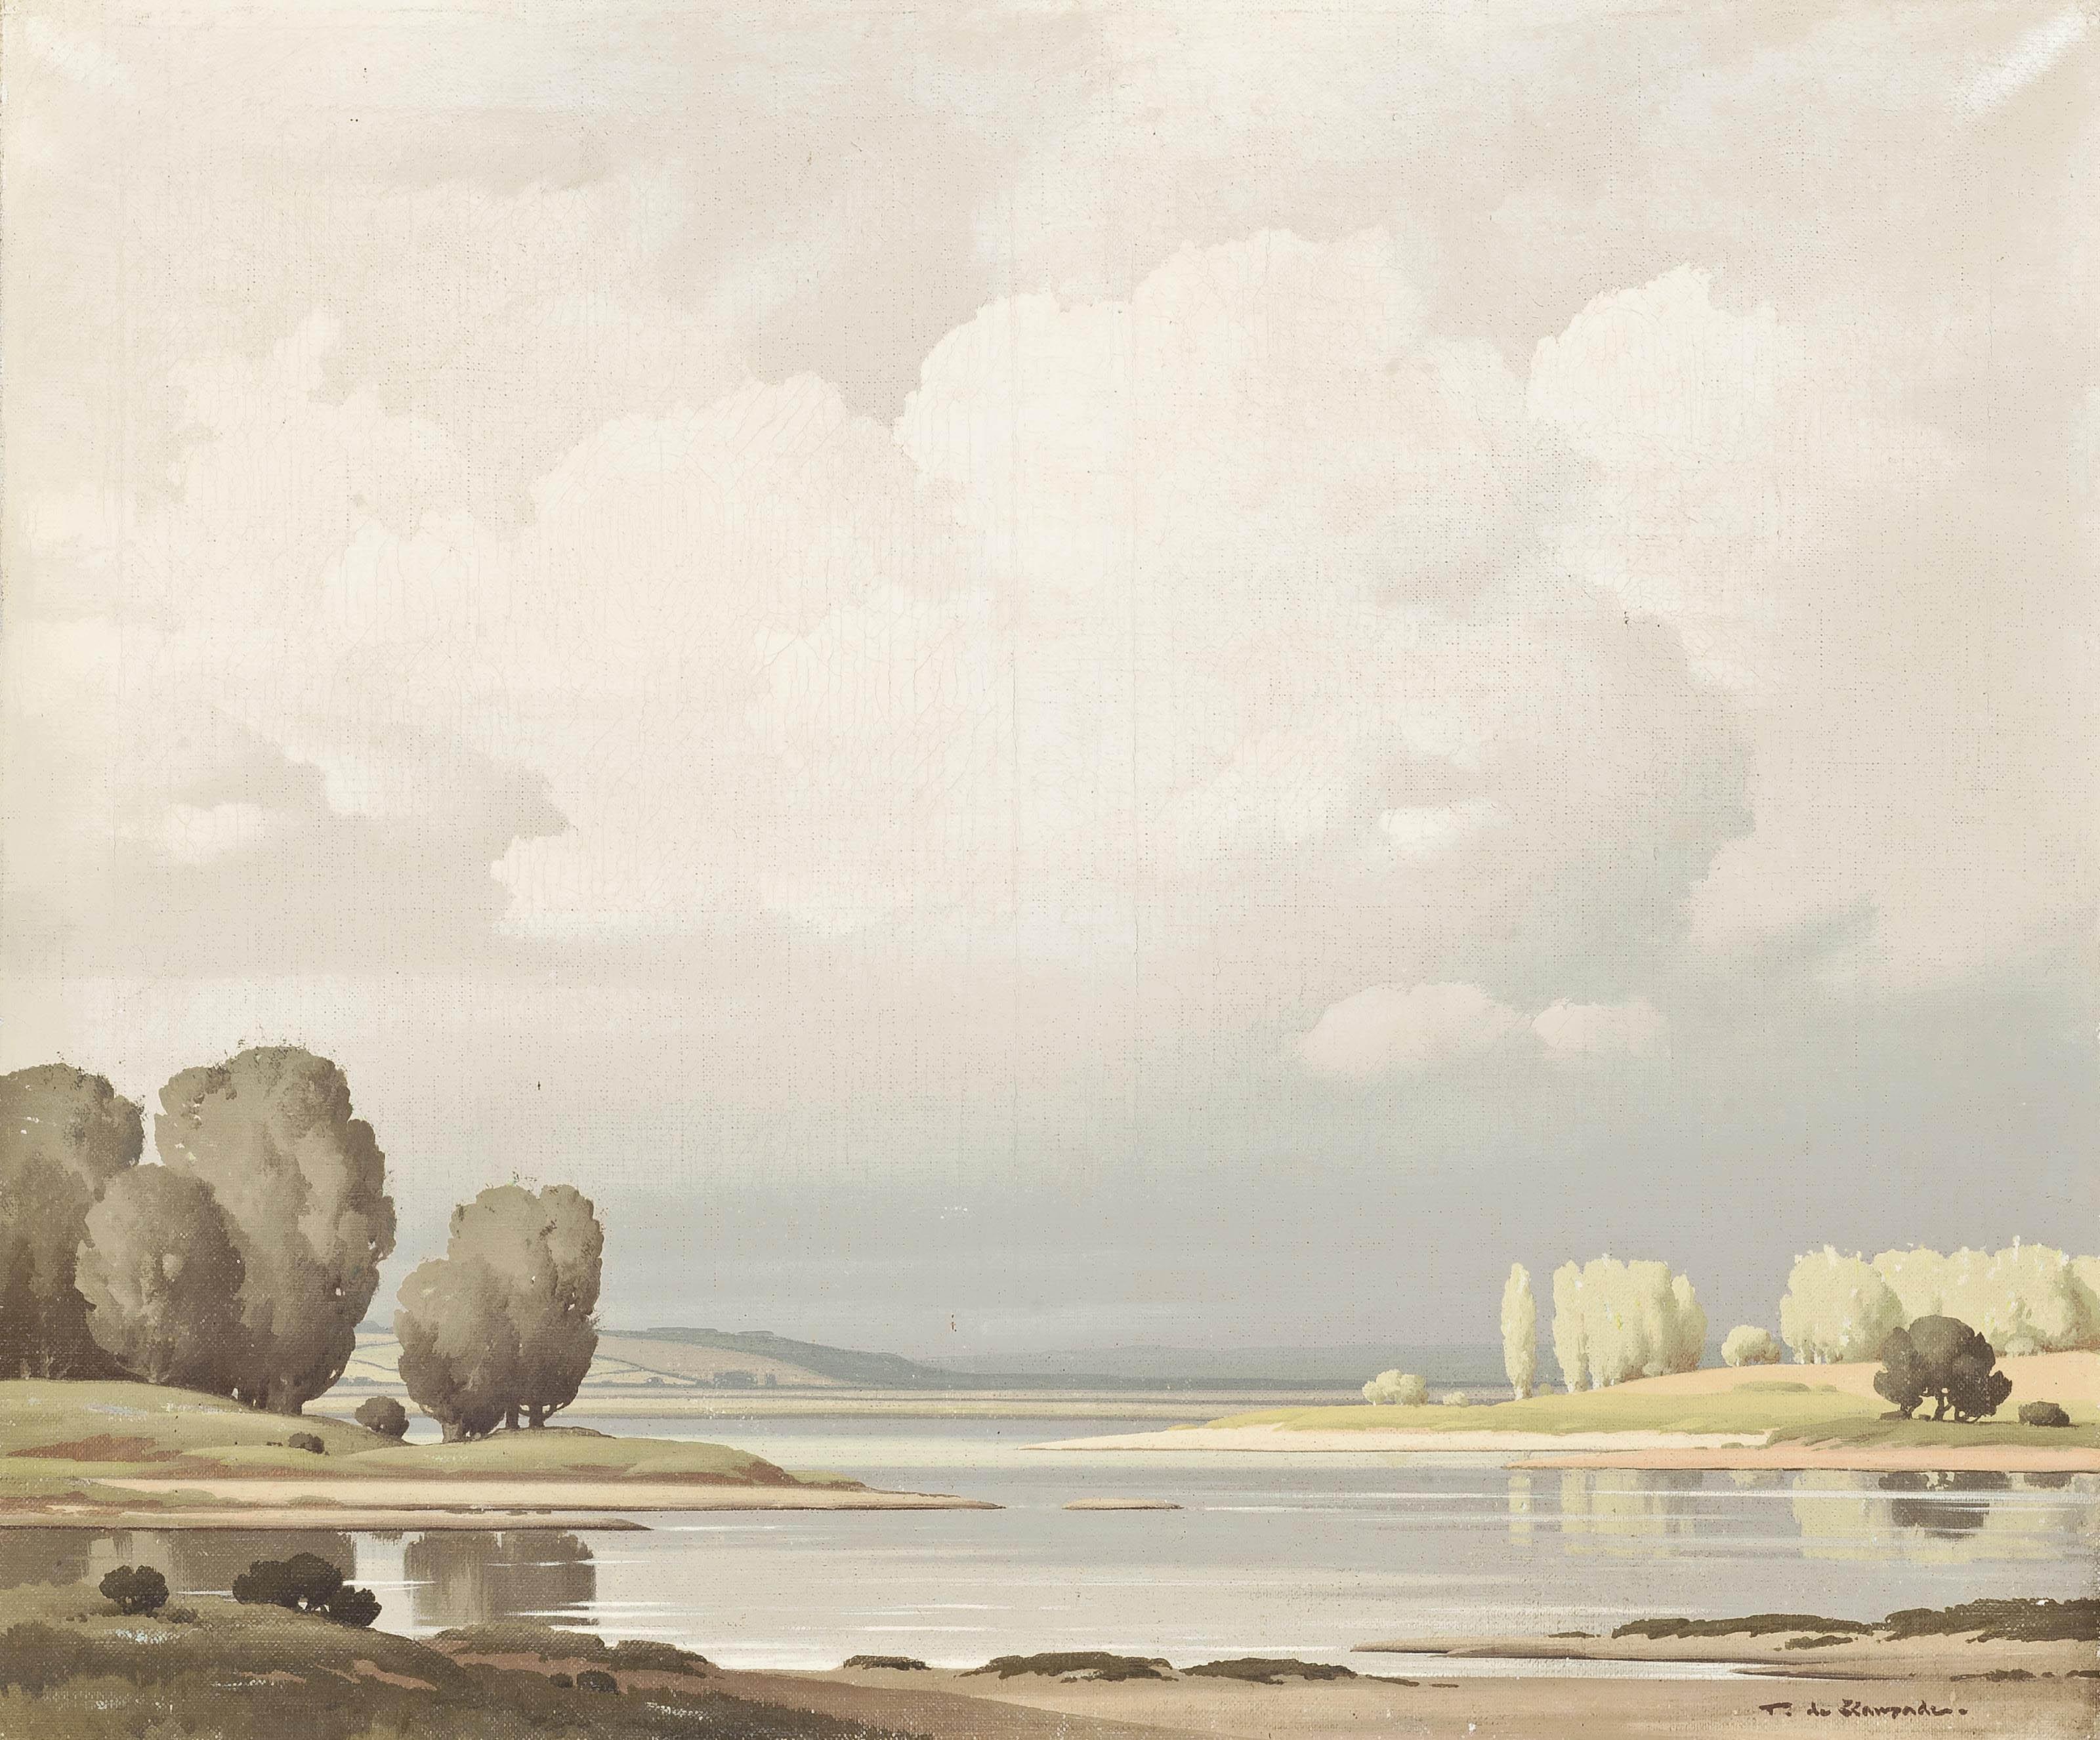 A tranquil river landscape